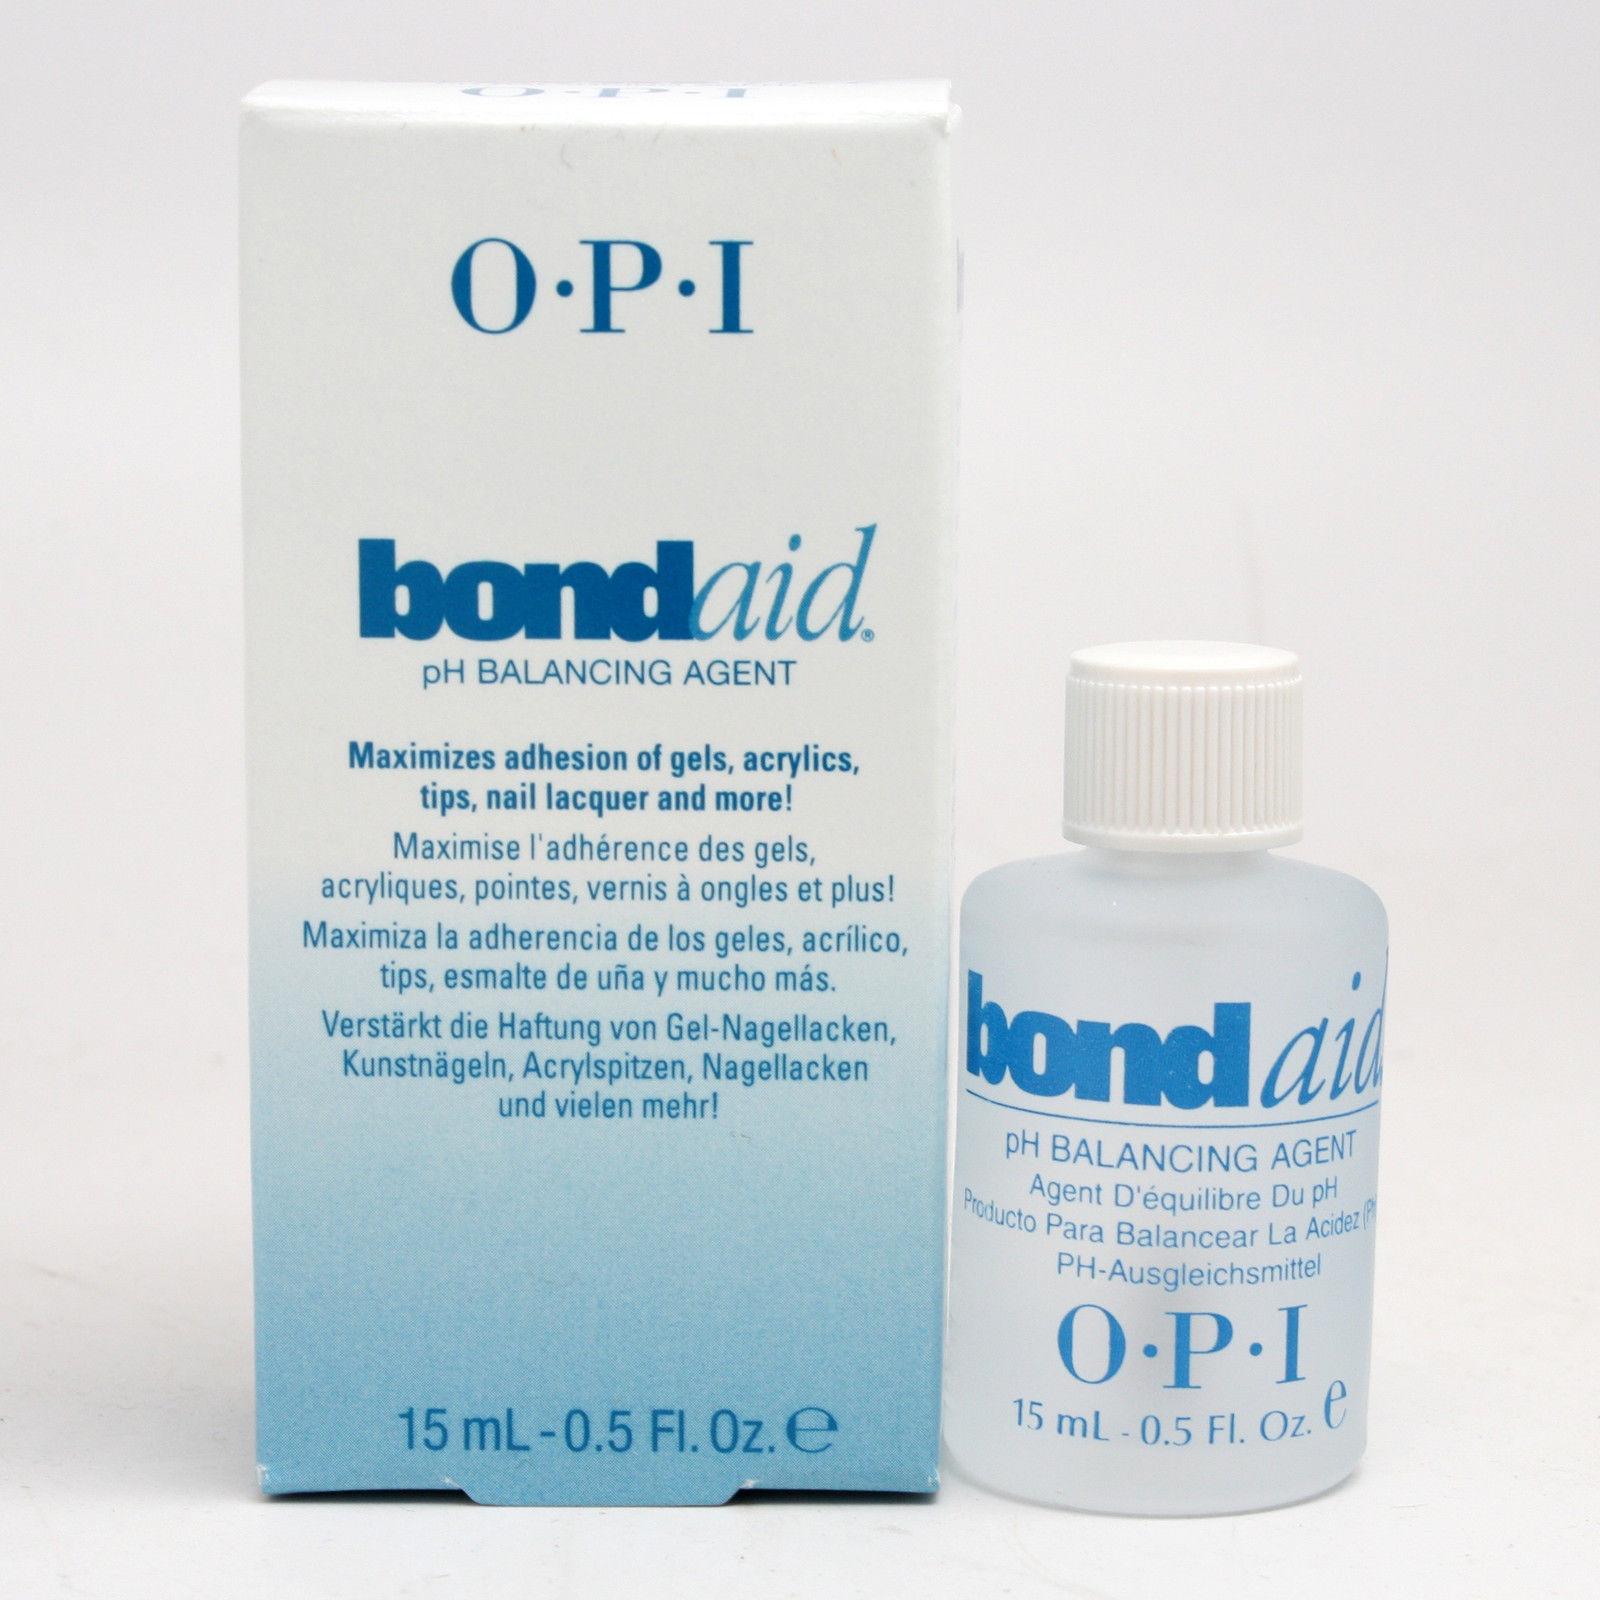 OPI Bond Aid False Nails, 0.4 oz